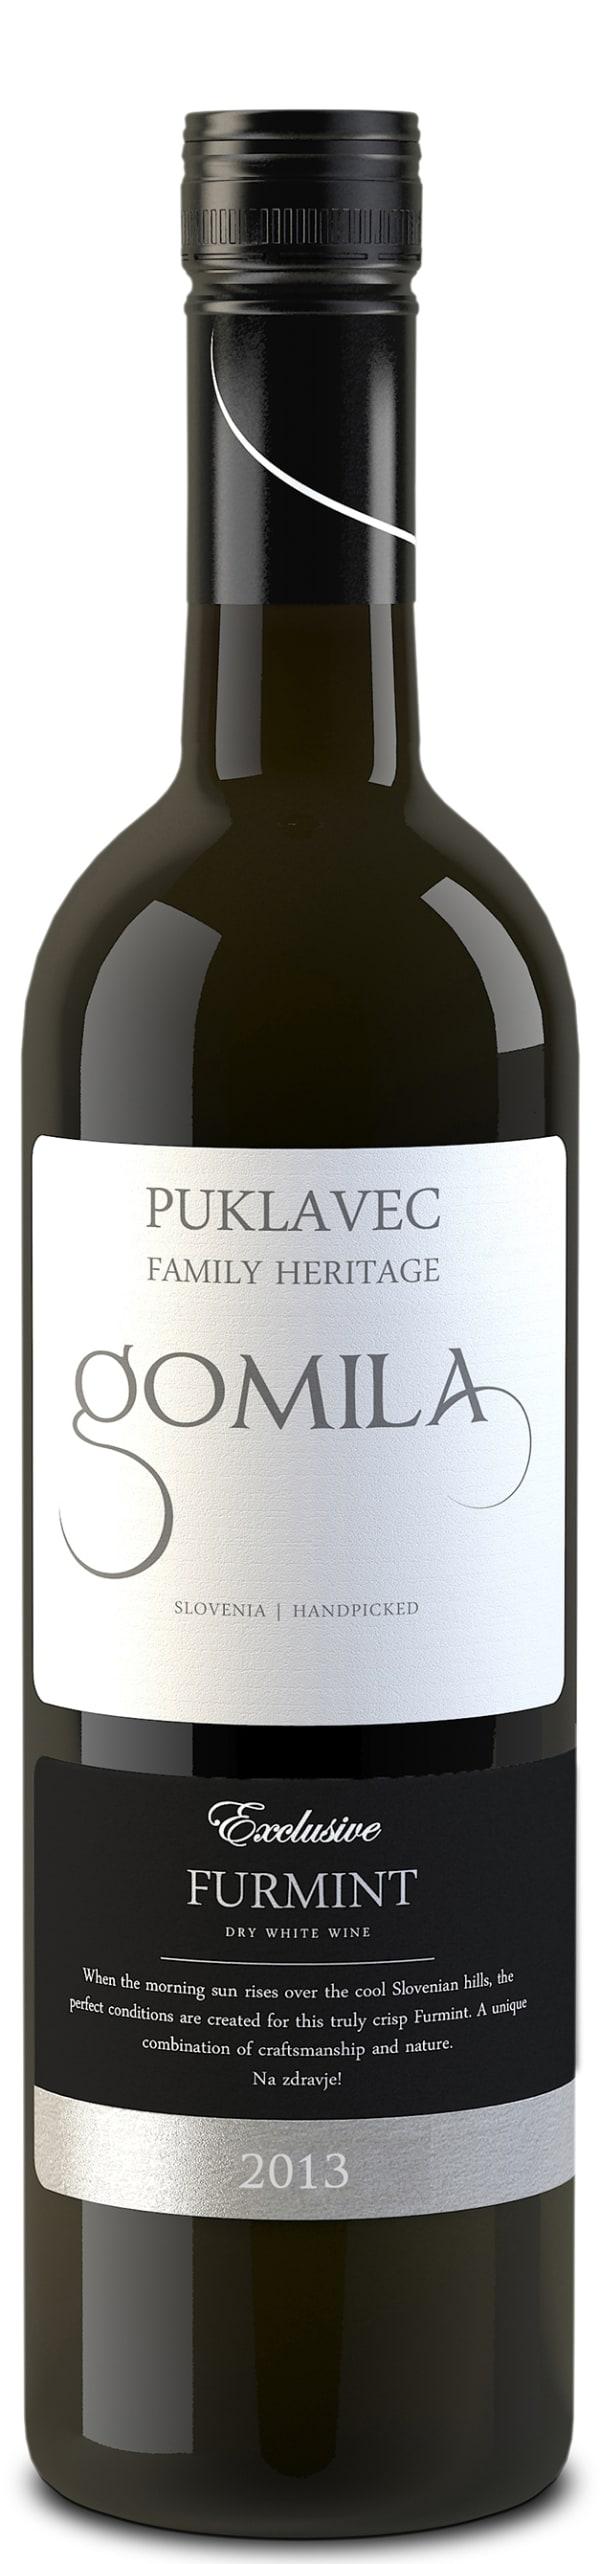 Puklavec Gomila Exclusive Furmint 2013